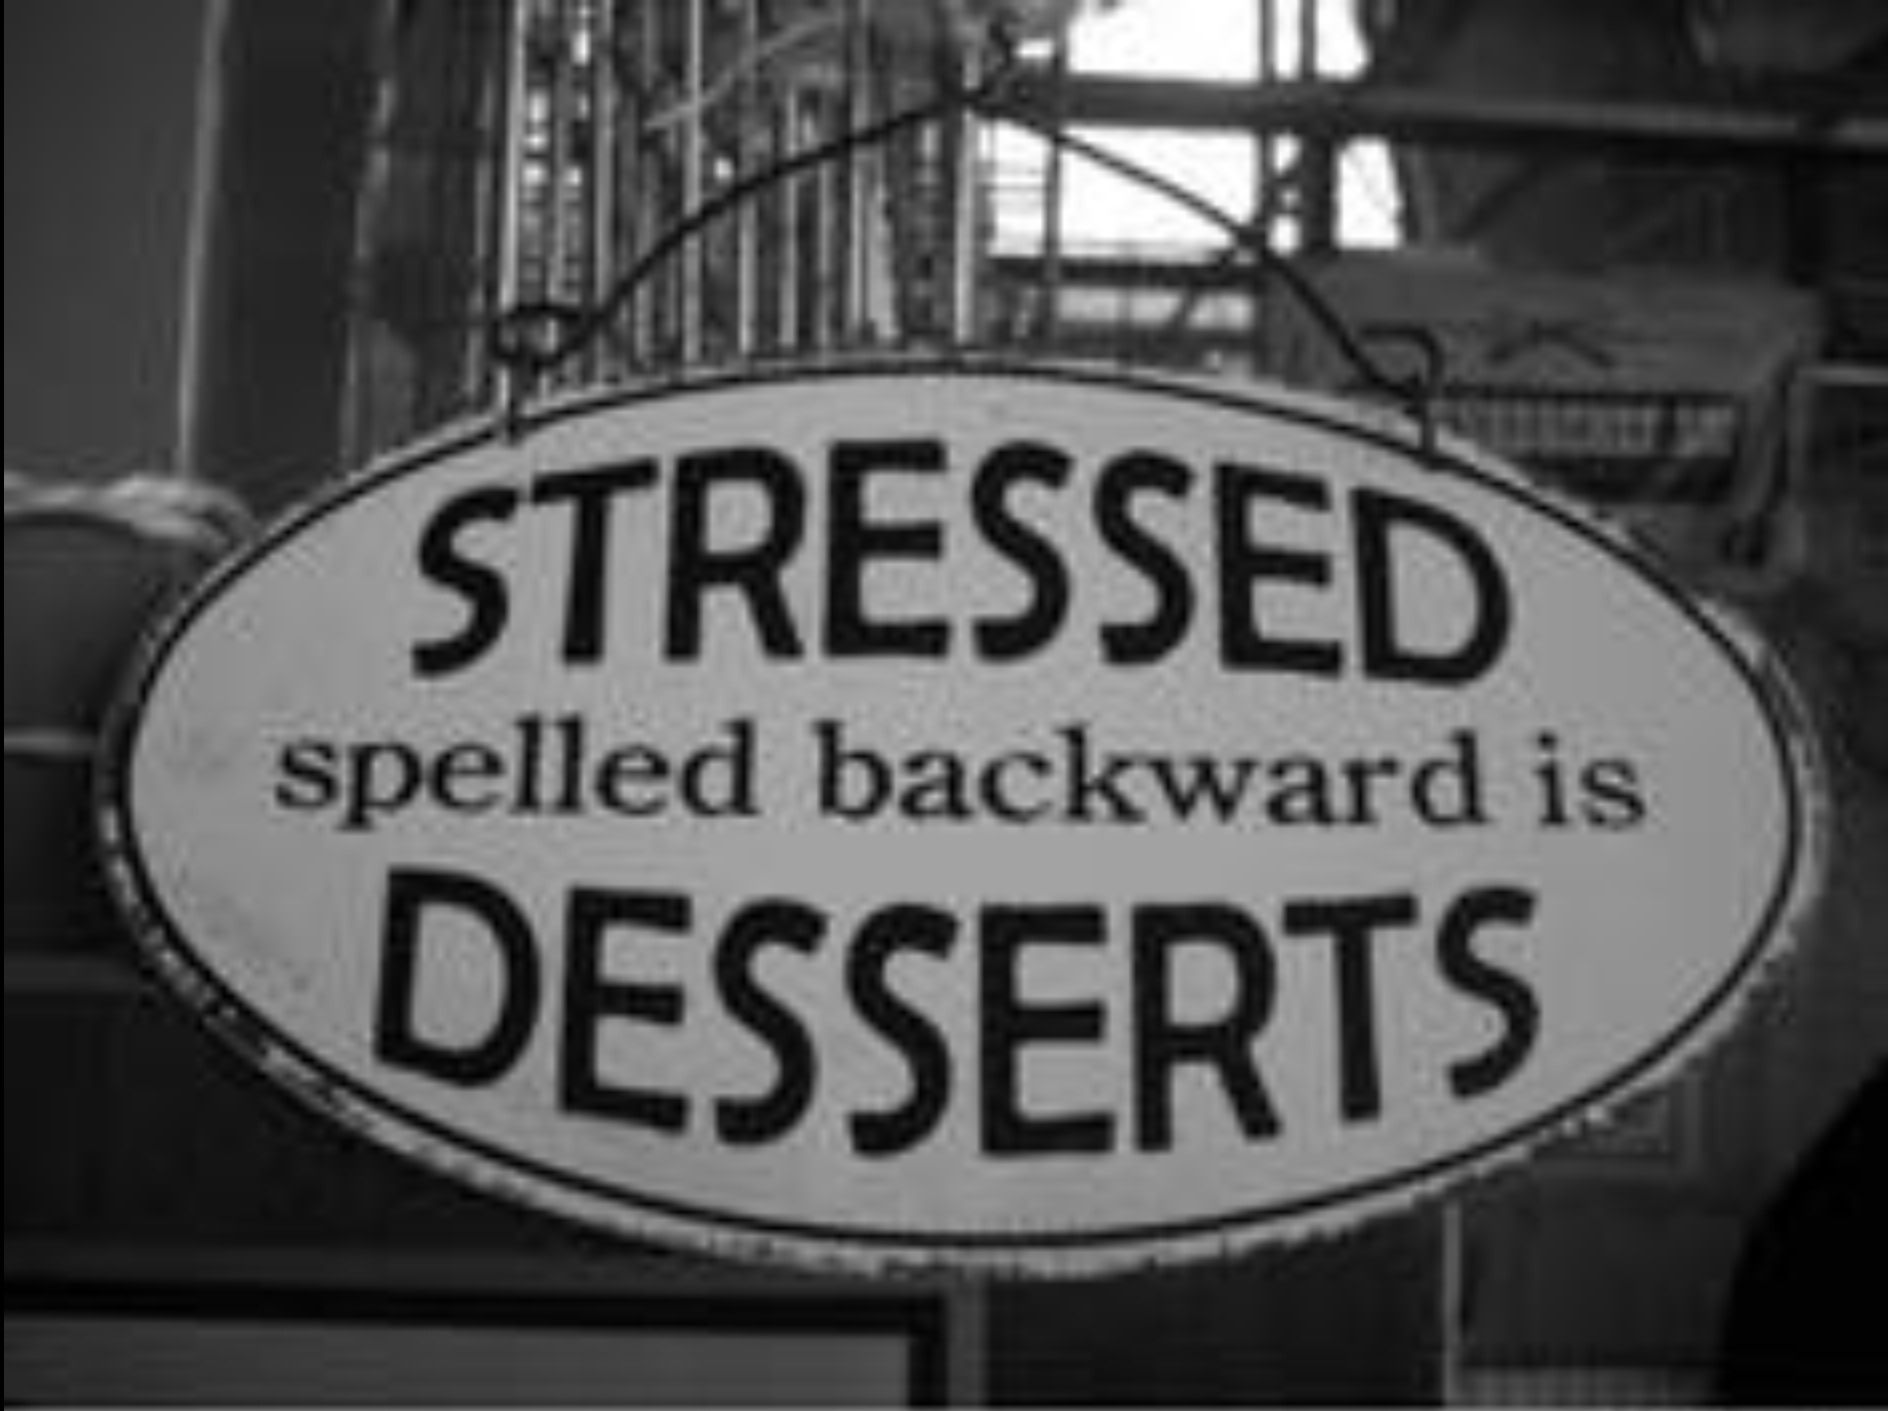 STRESSED=DESSERTS